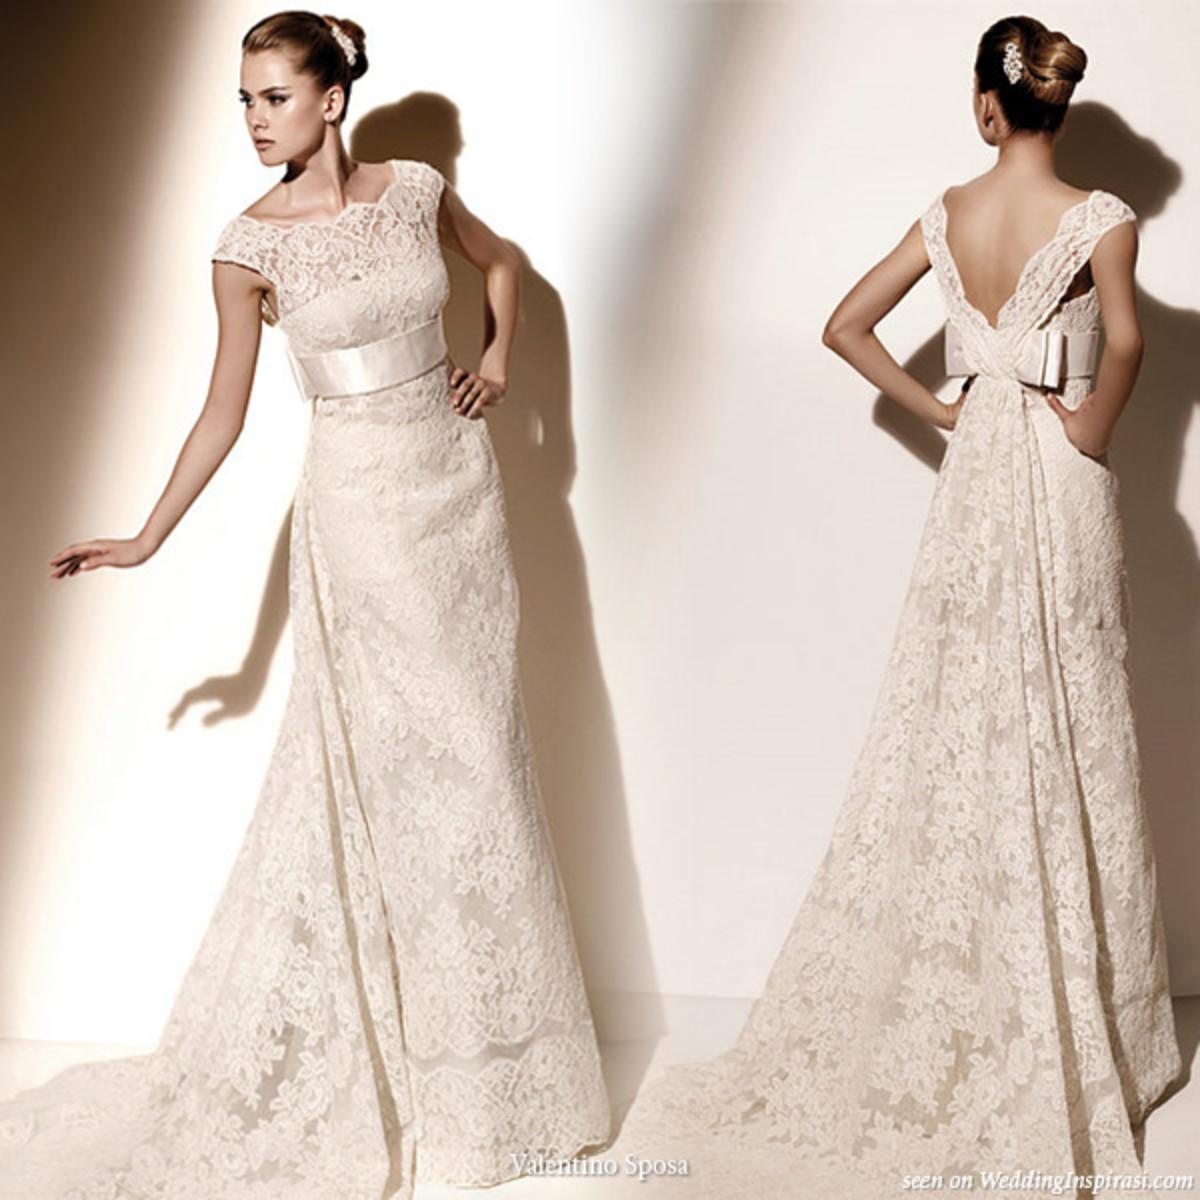 Wedding Dresses For Thin Brides : Flattering wedding dresses for skinny brides